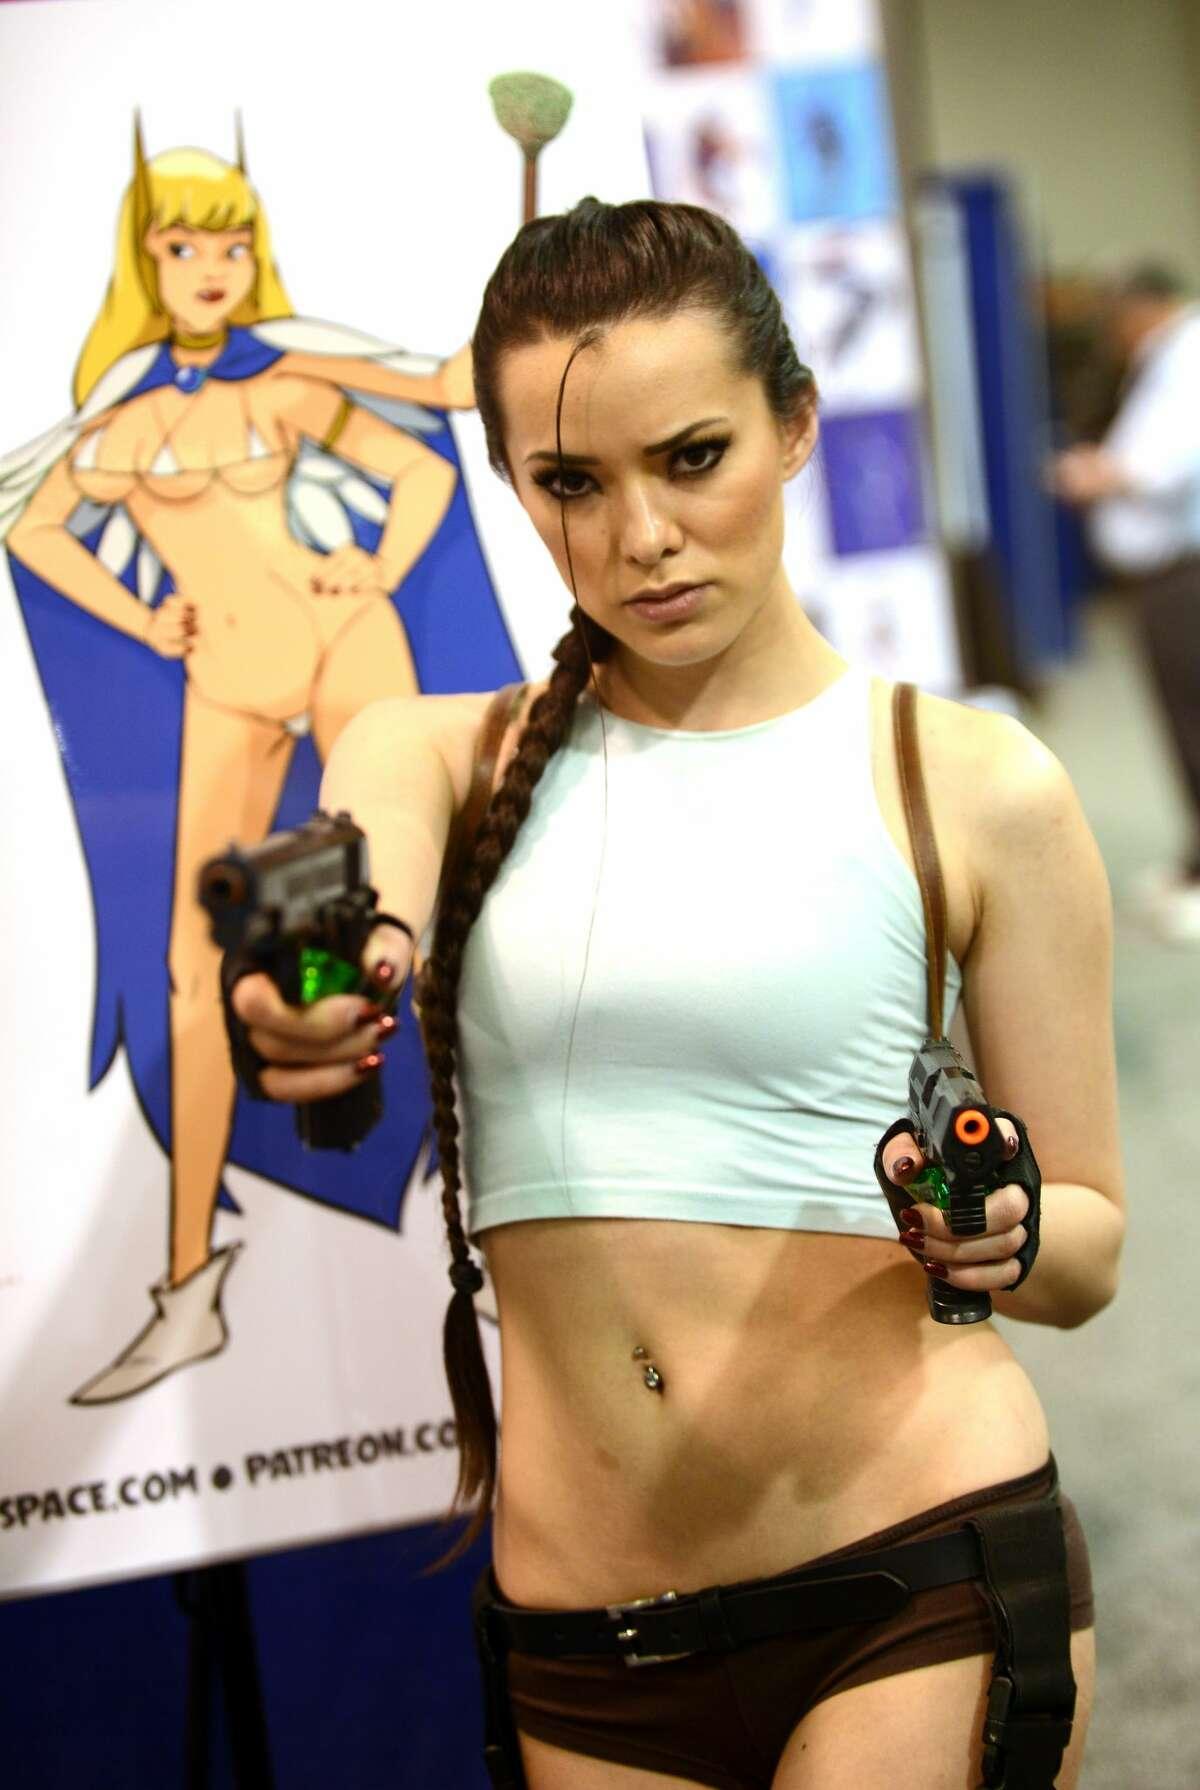 Joanie Brosas as Lara Croft attends Day 1 of WonderCon held at Anaheim Convention Center on March 23, 2018 in Anaheim, California.